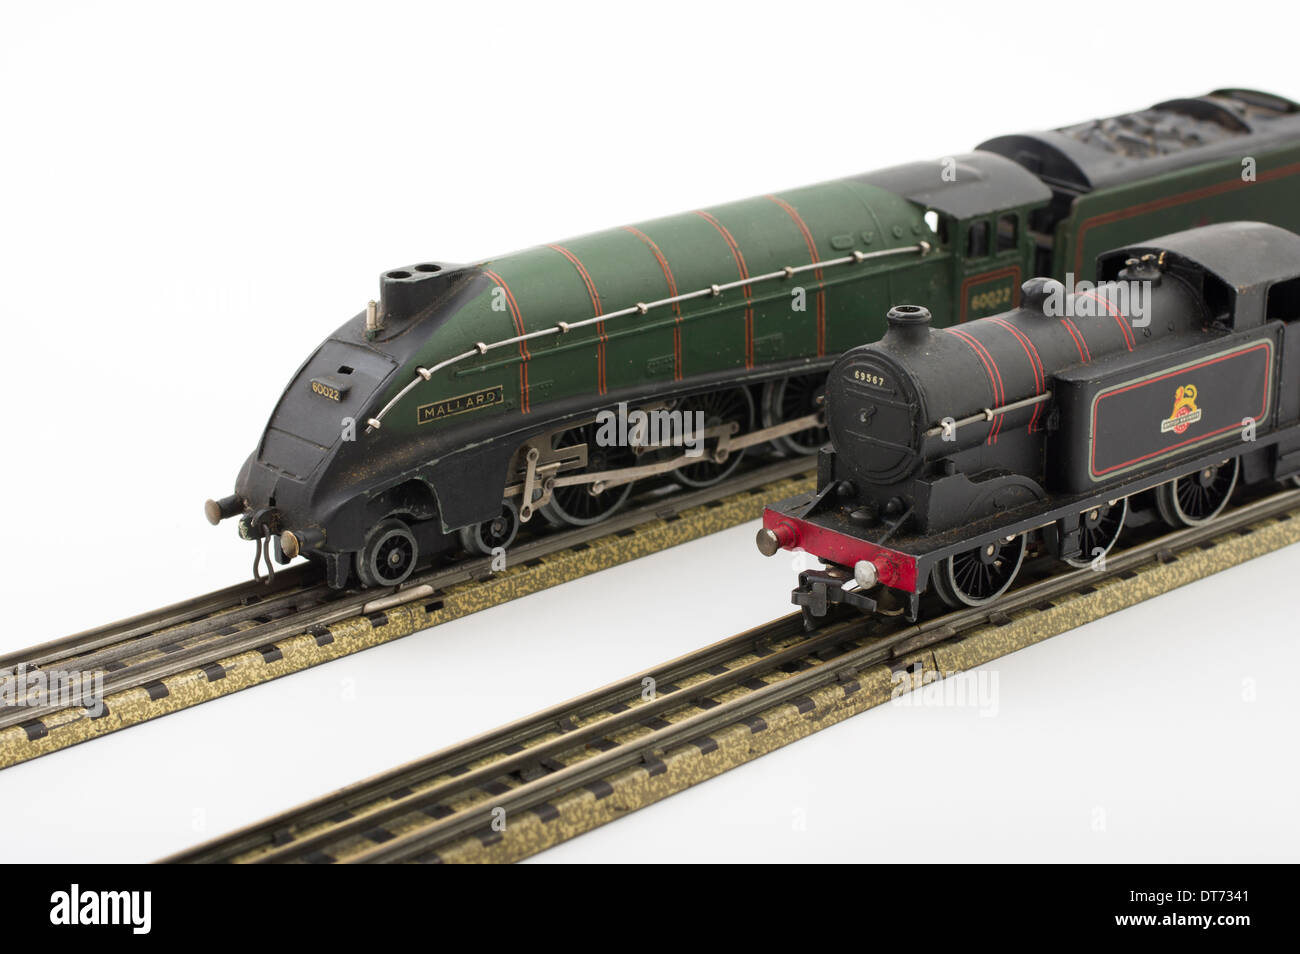 Hornby Dublo Green Mallard Model Train with EDL17 Tank Locomotive Train Classic British Children's Toy - Stock Image